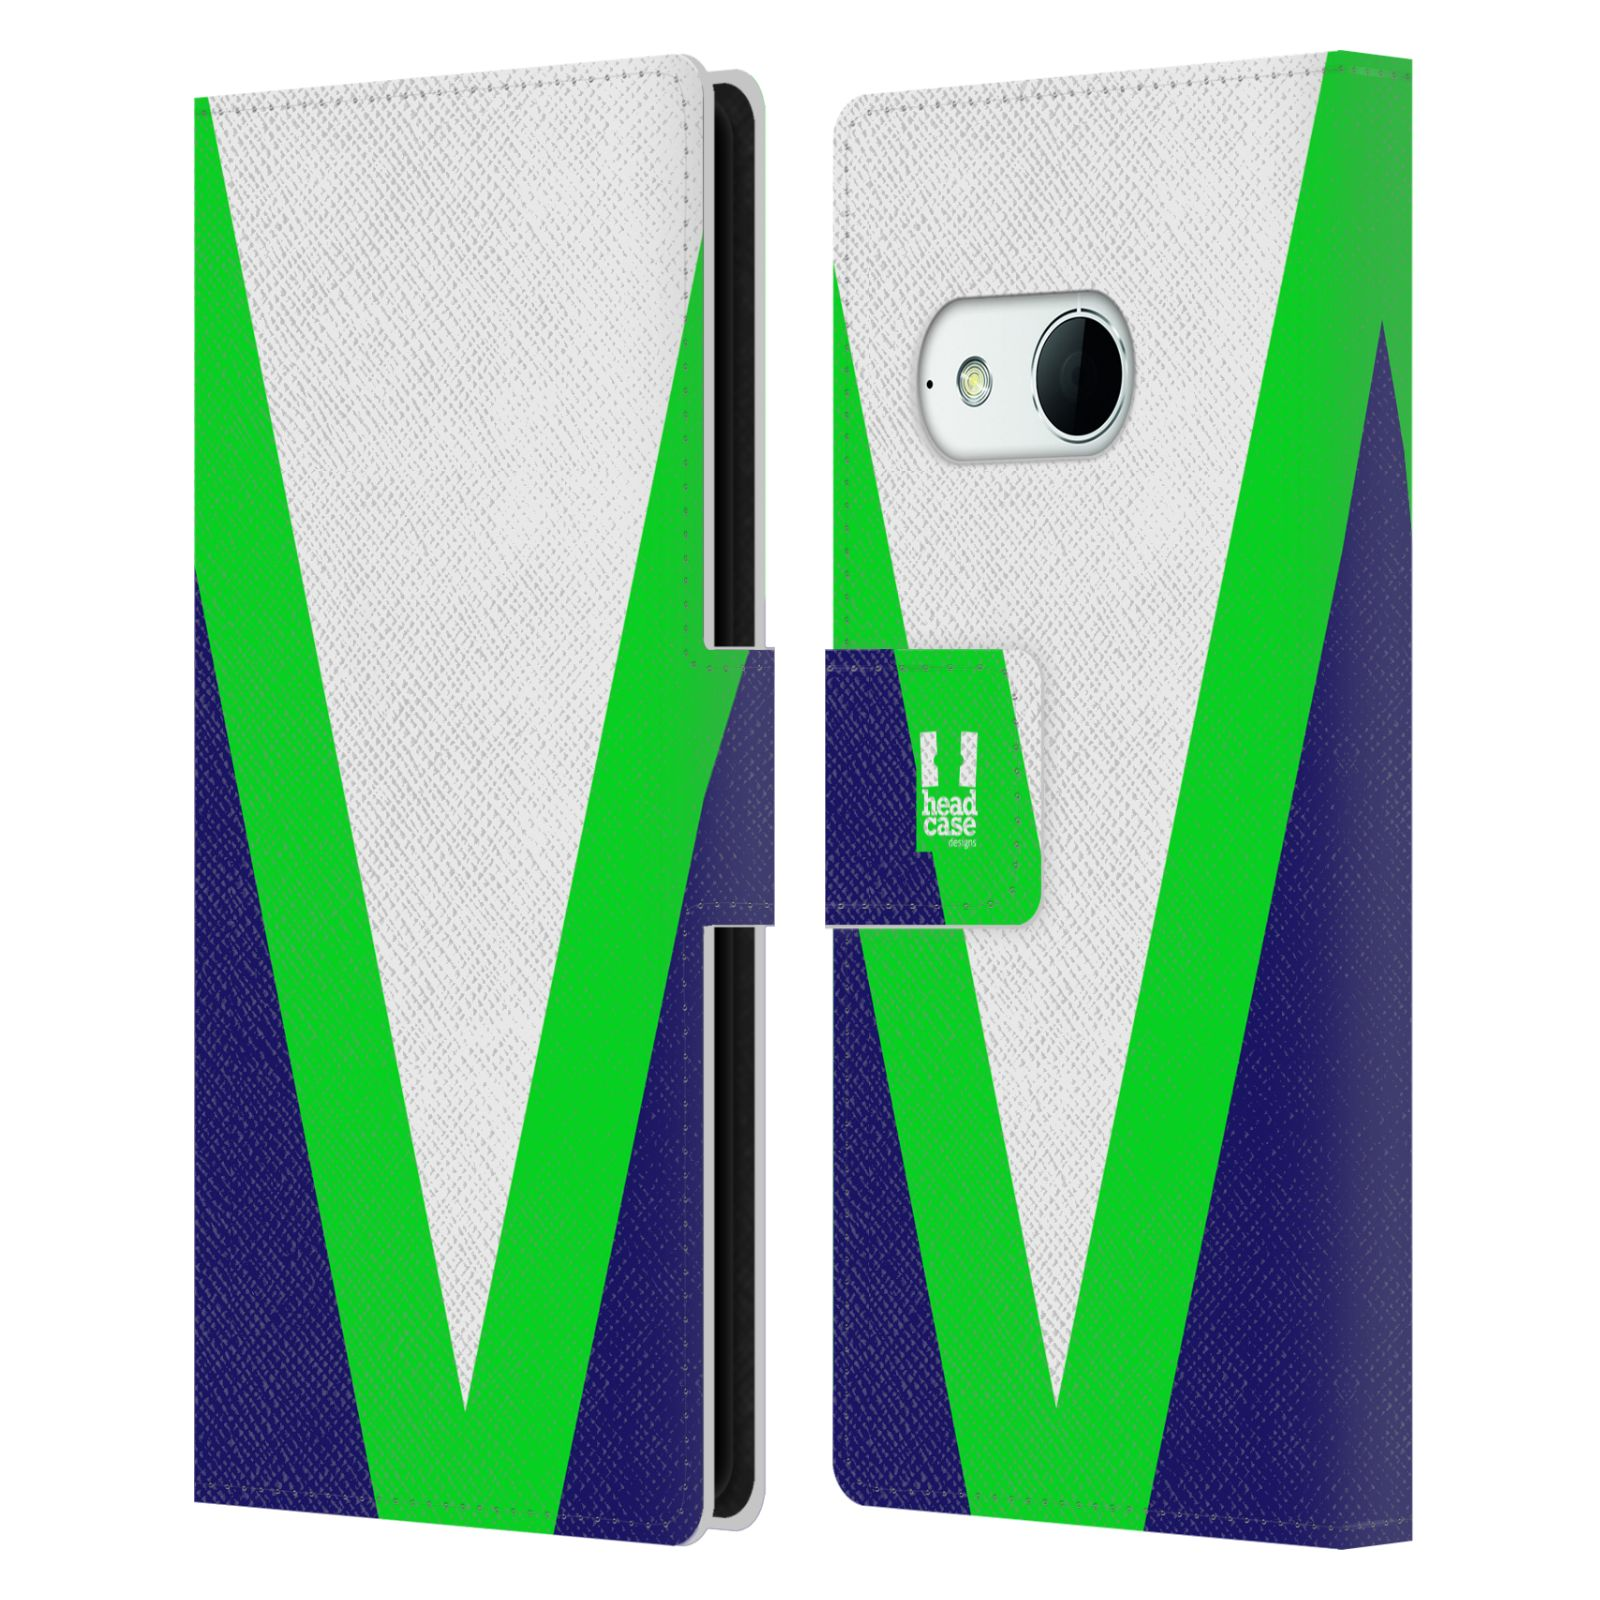 HEAD CASE Flipové pouzdro pro mobil HTC ONE MINI 2 barevné tvary zelená a modrá